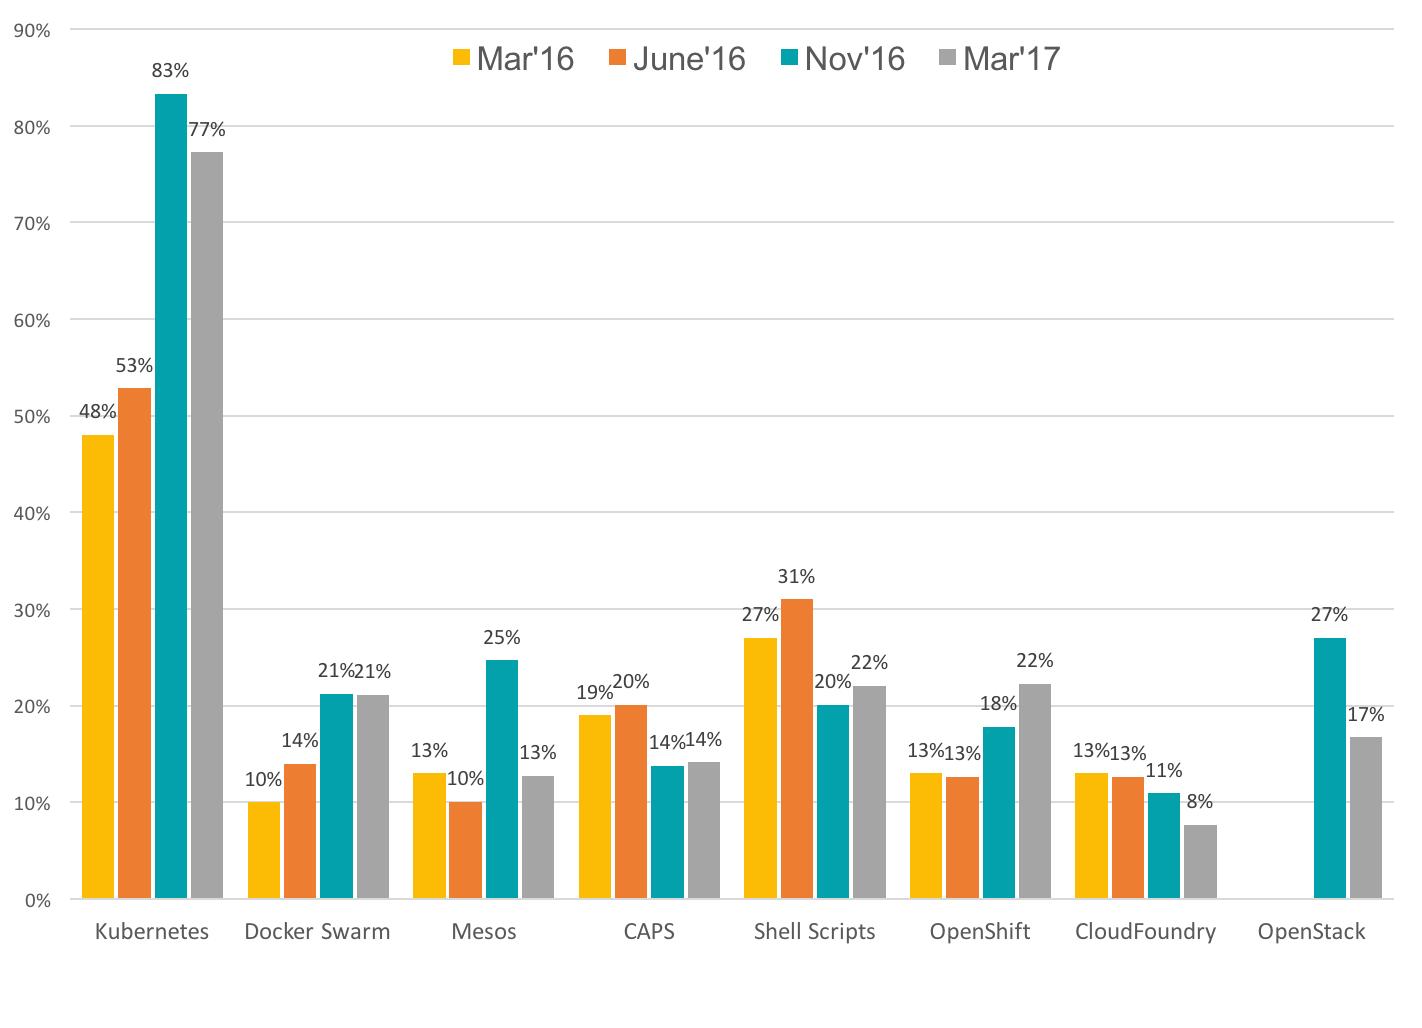 Figure 1: Container Management Platforms Preferences